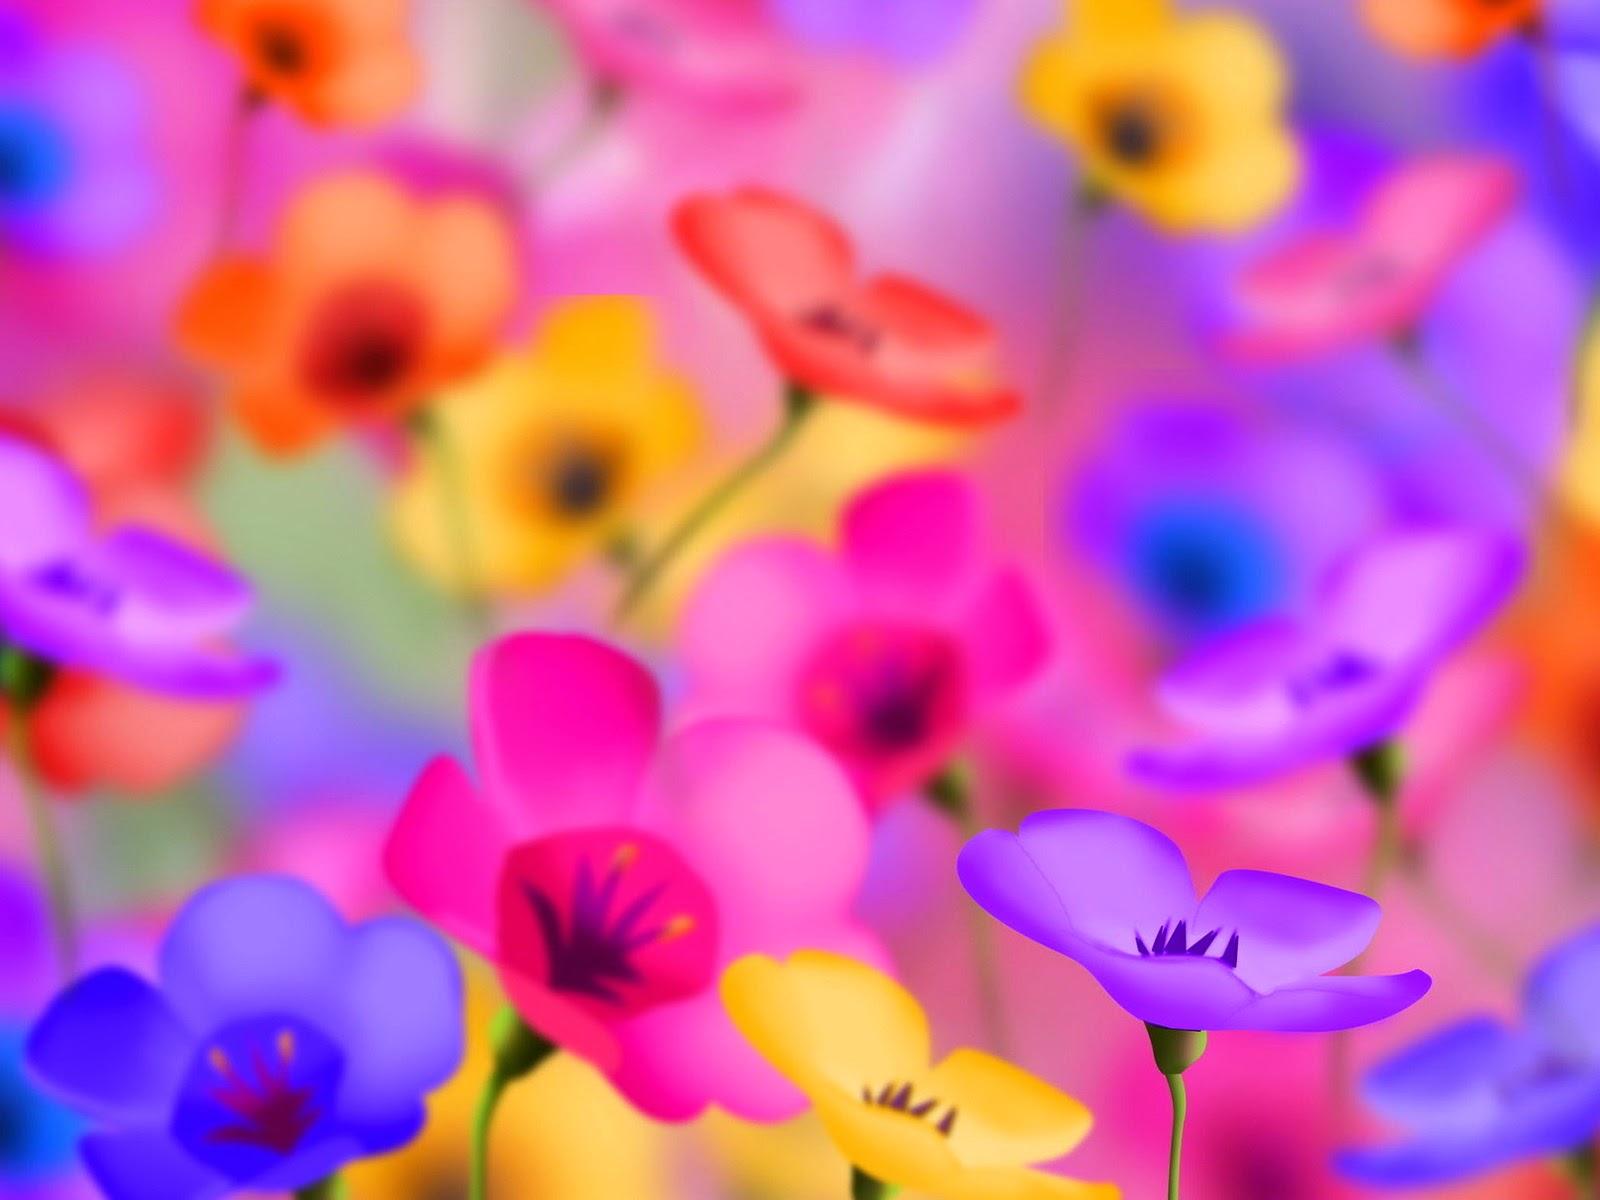 beautiful flowers wallpapers for mobile,petal,flower,violet,purple,plant